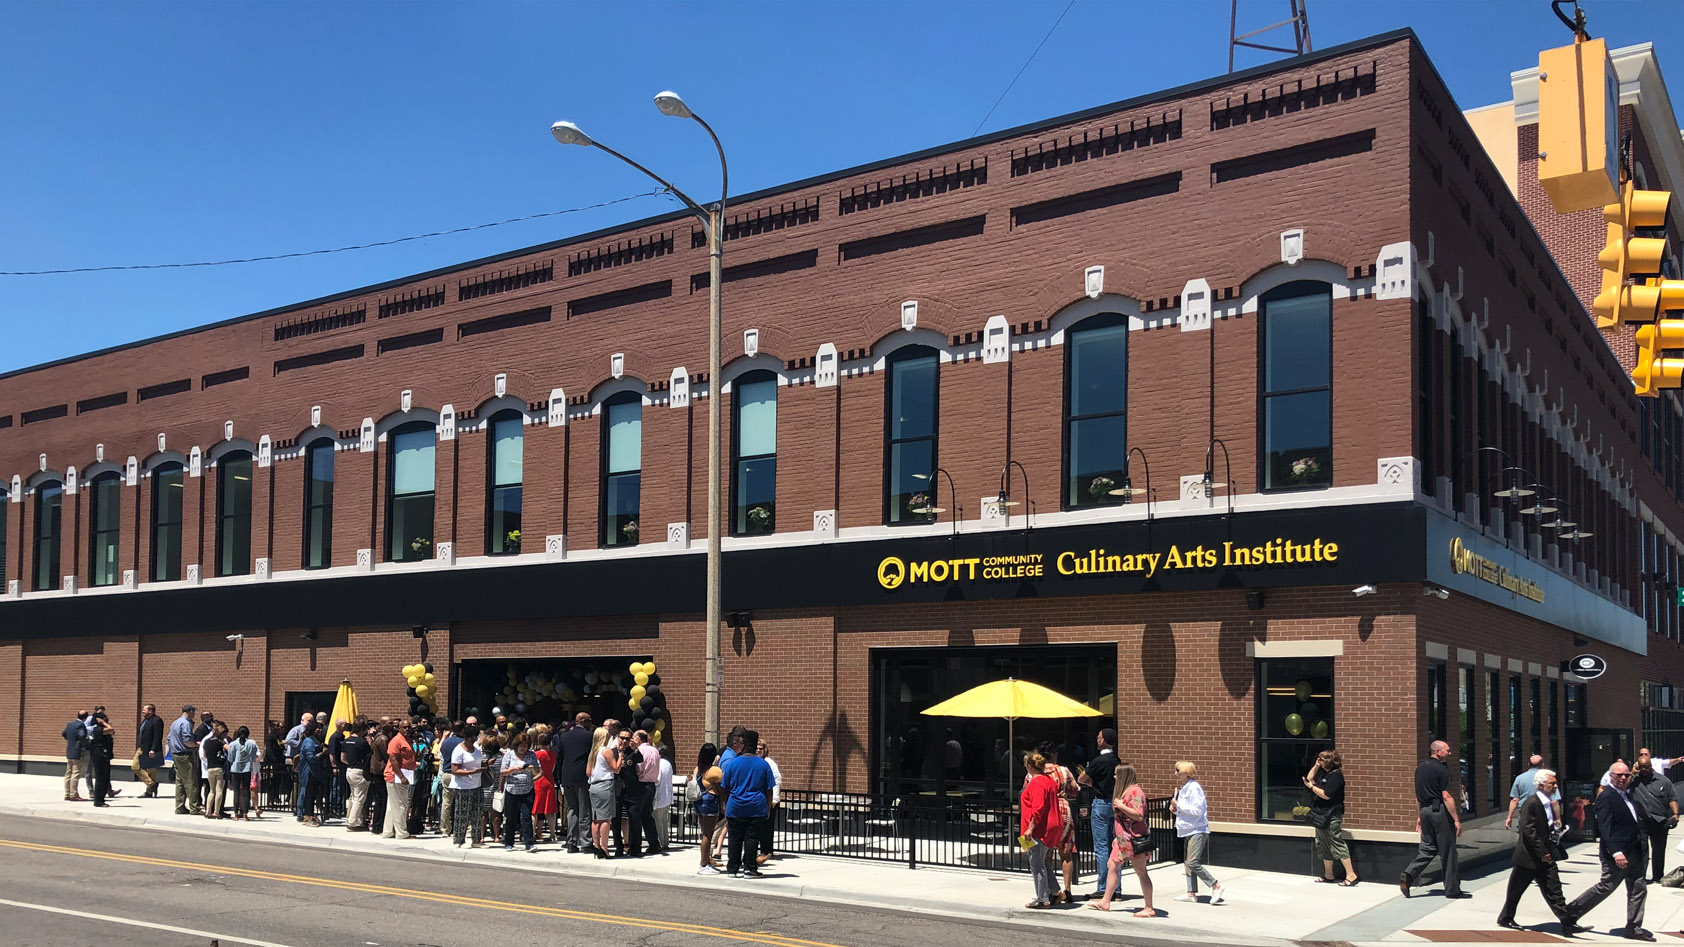 Mott Community College Culinary Arts Institute, Flint, MI